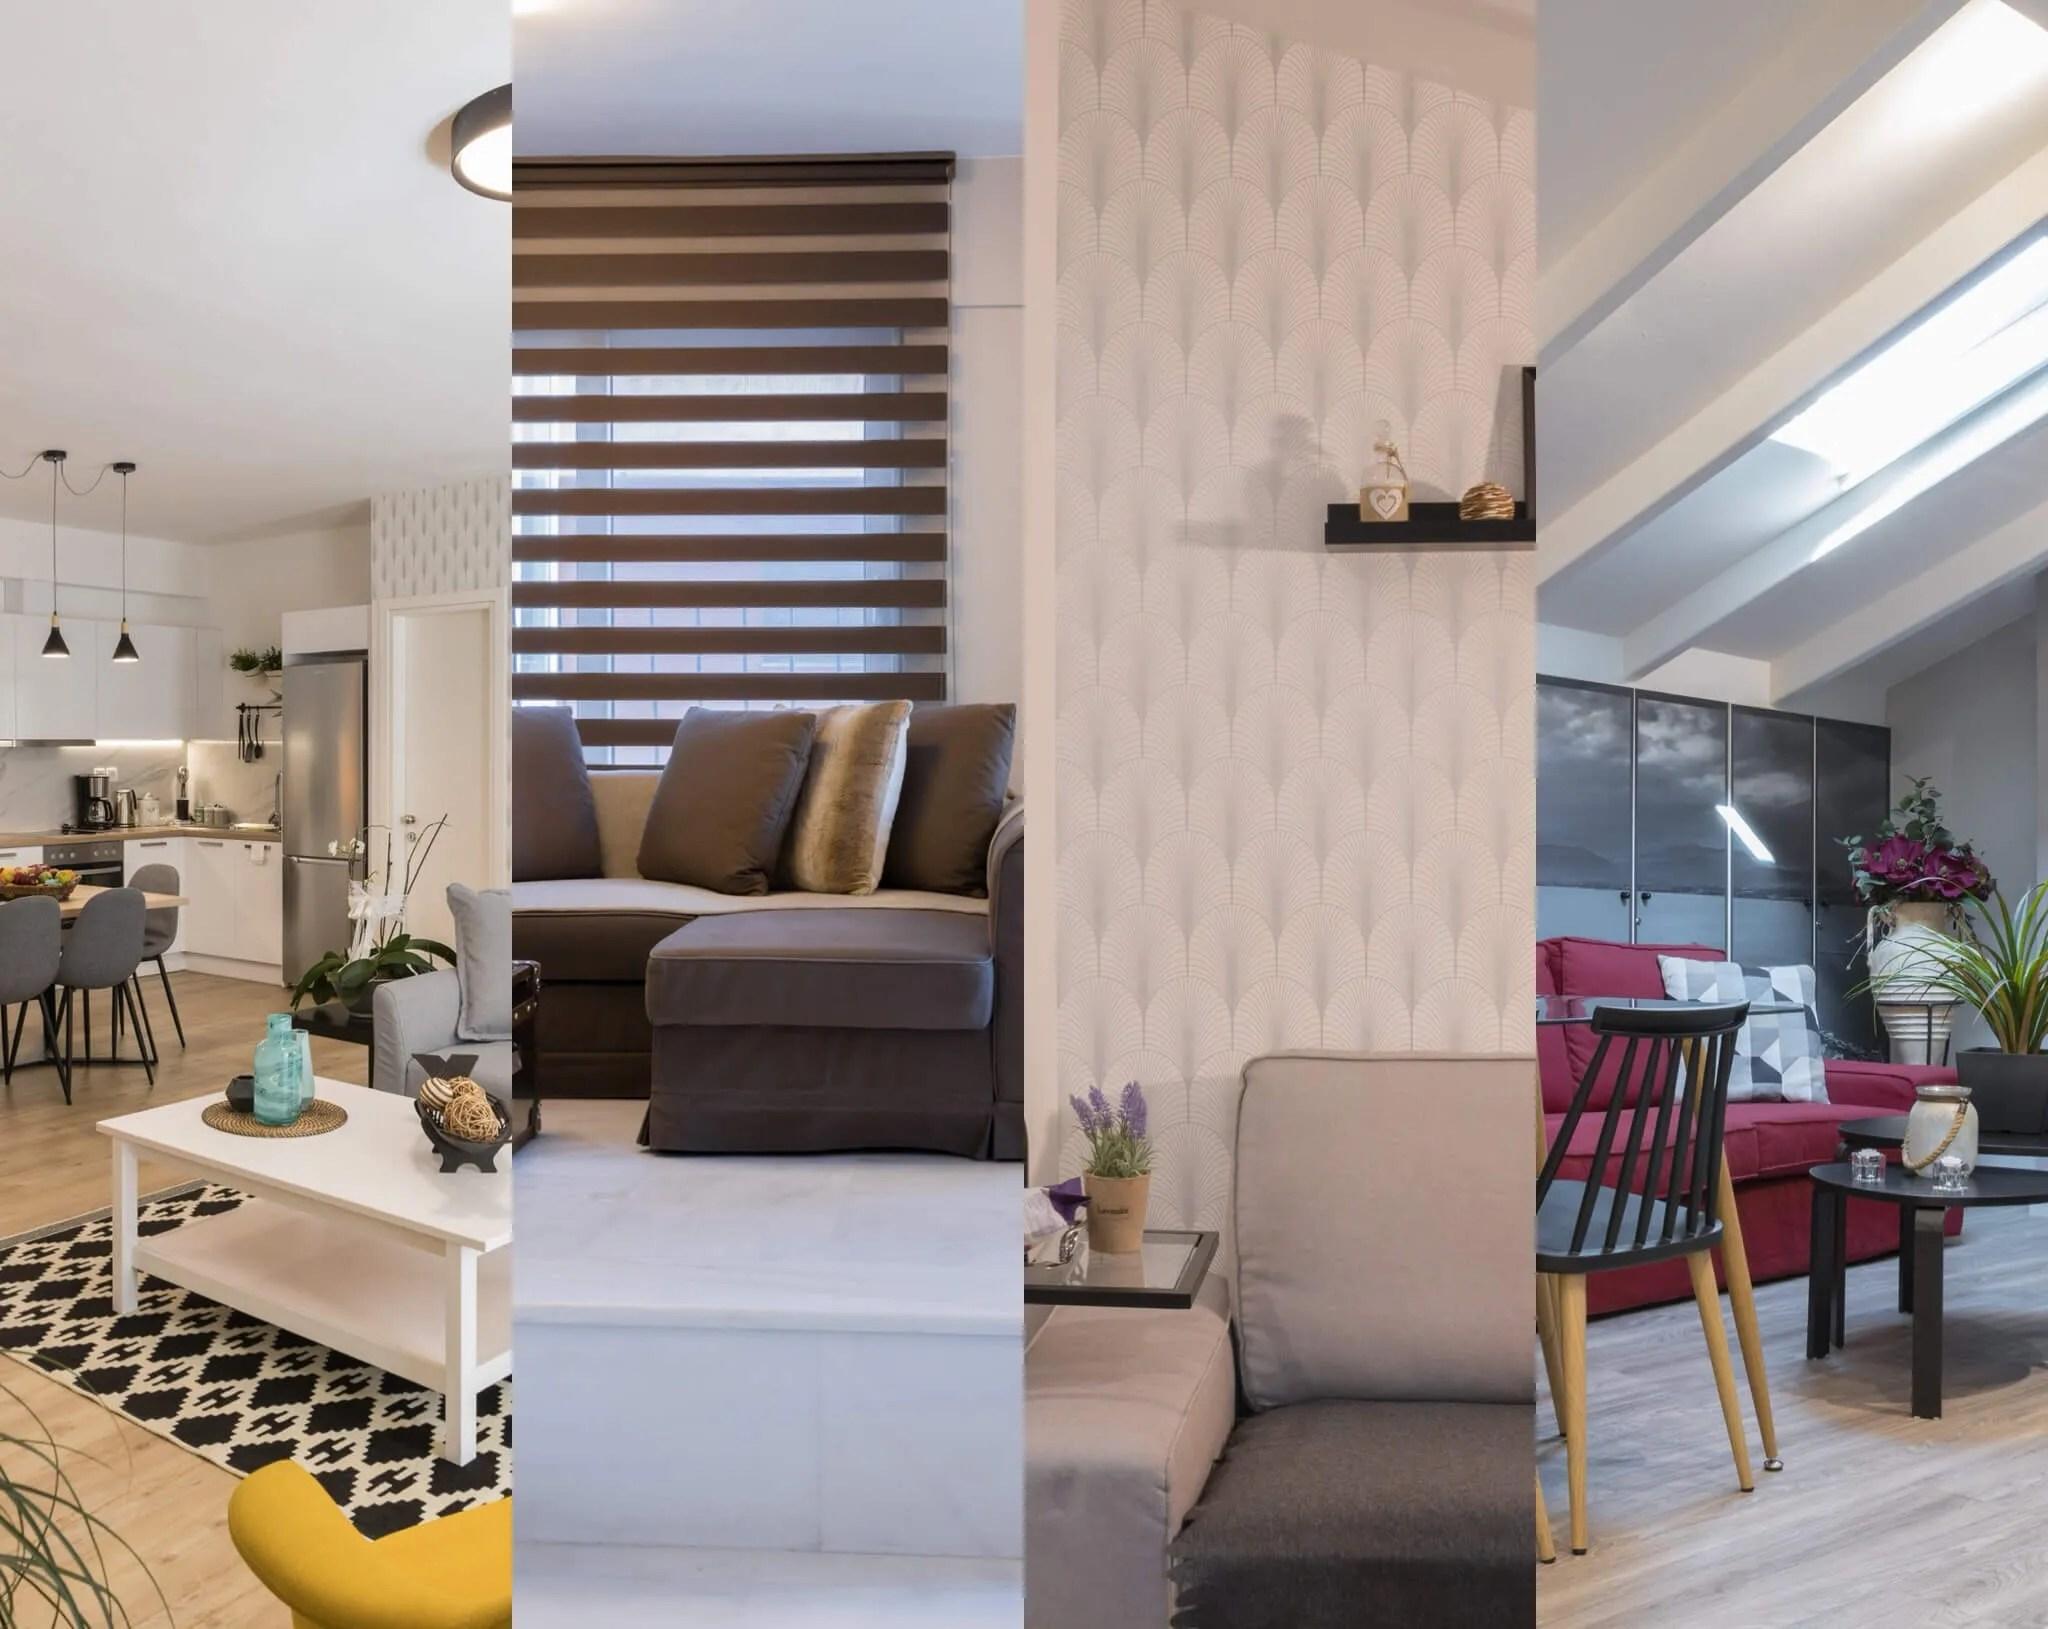 Vida Residential Apartments Nafplio Wallpaper